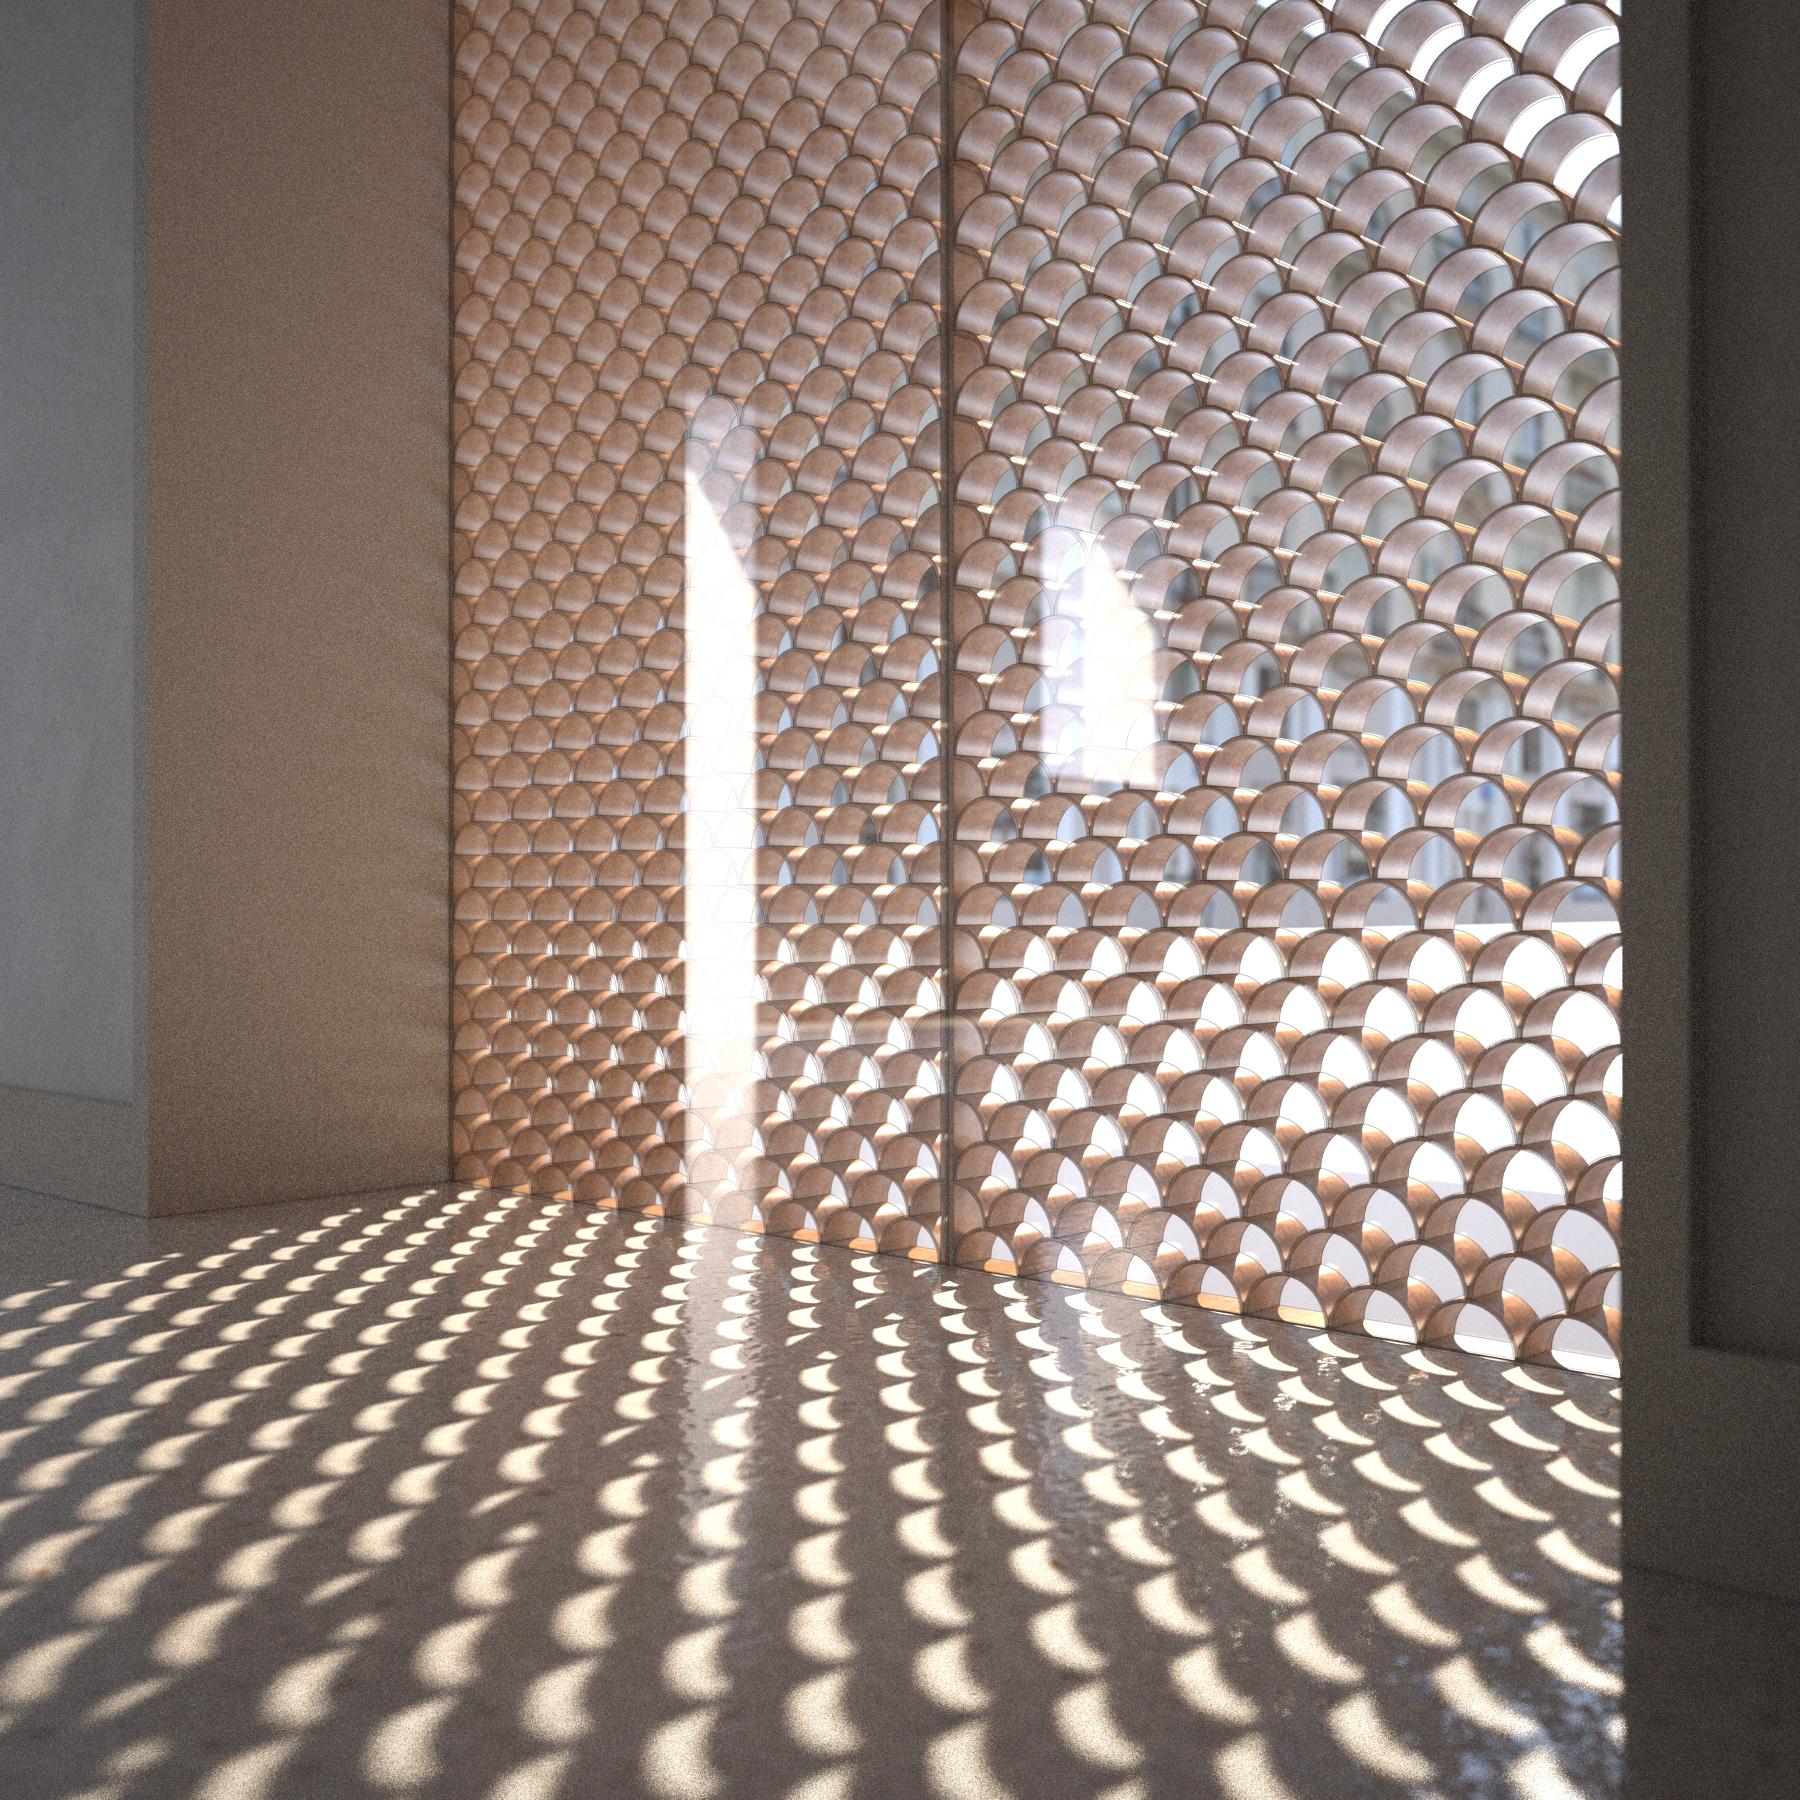 171020_office arched shutters_closeup_golden_editFB.jpg